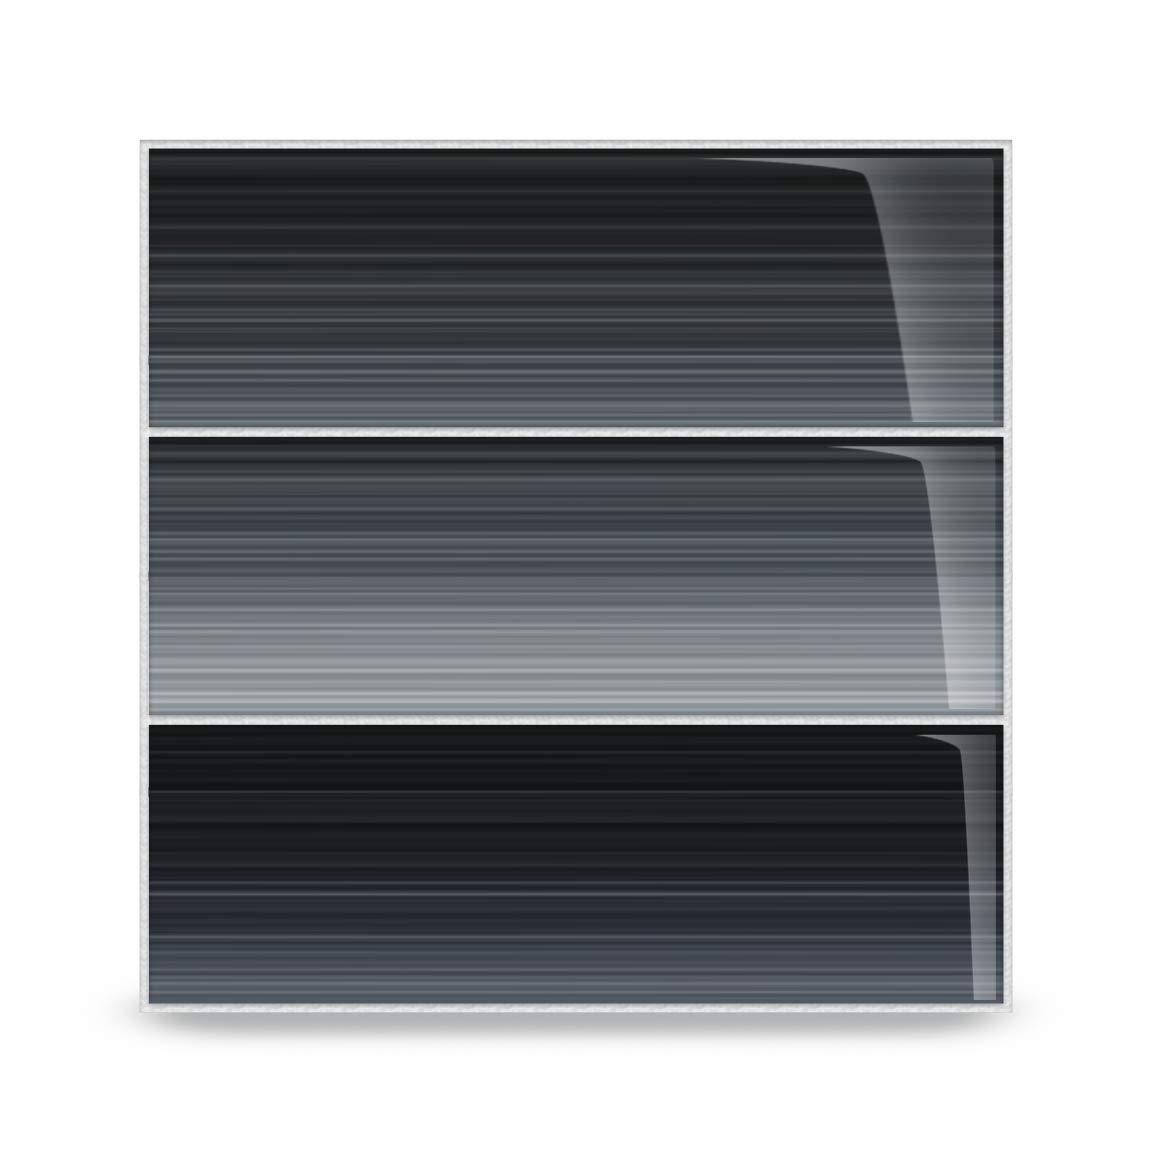 Bodesi Late Night Glass Subway Tile for Kitchen Backsplash or Bathroom, 4x12